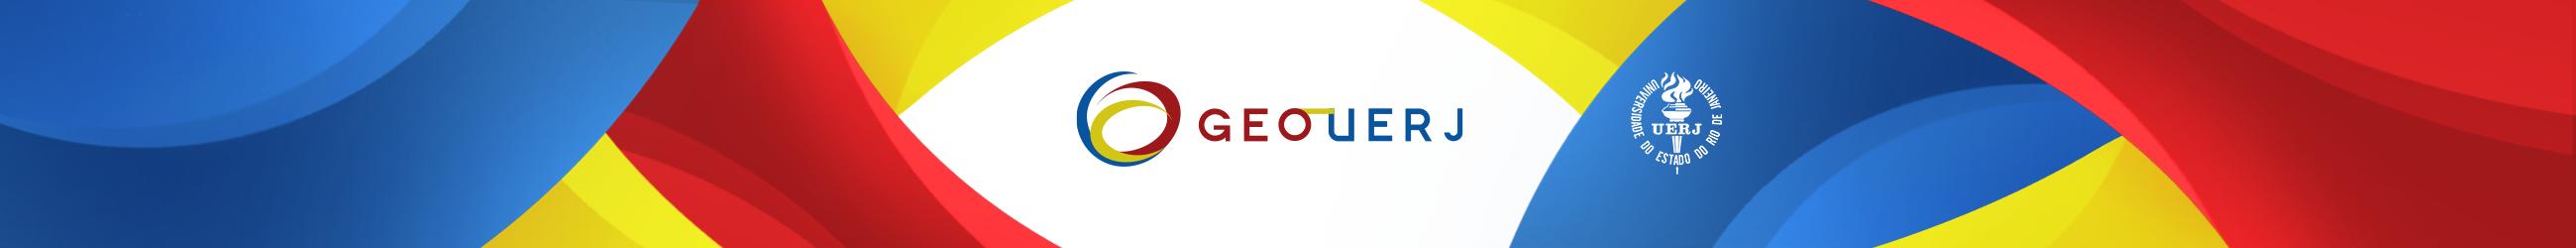 Banner GeoUERJ